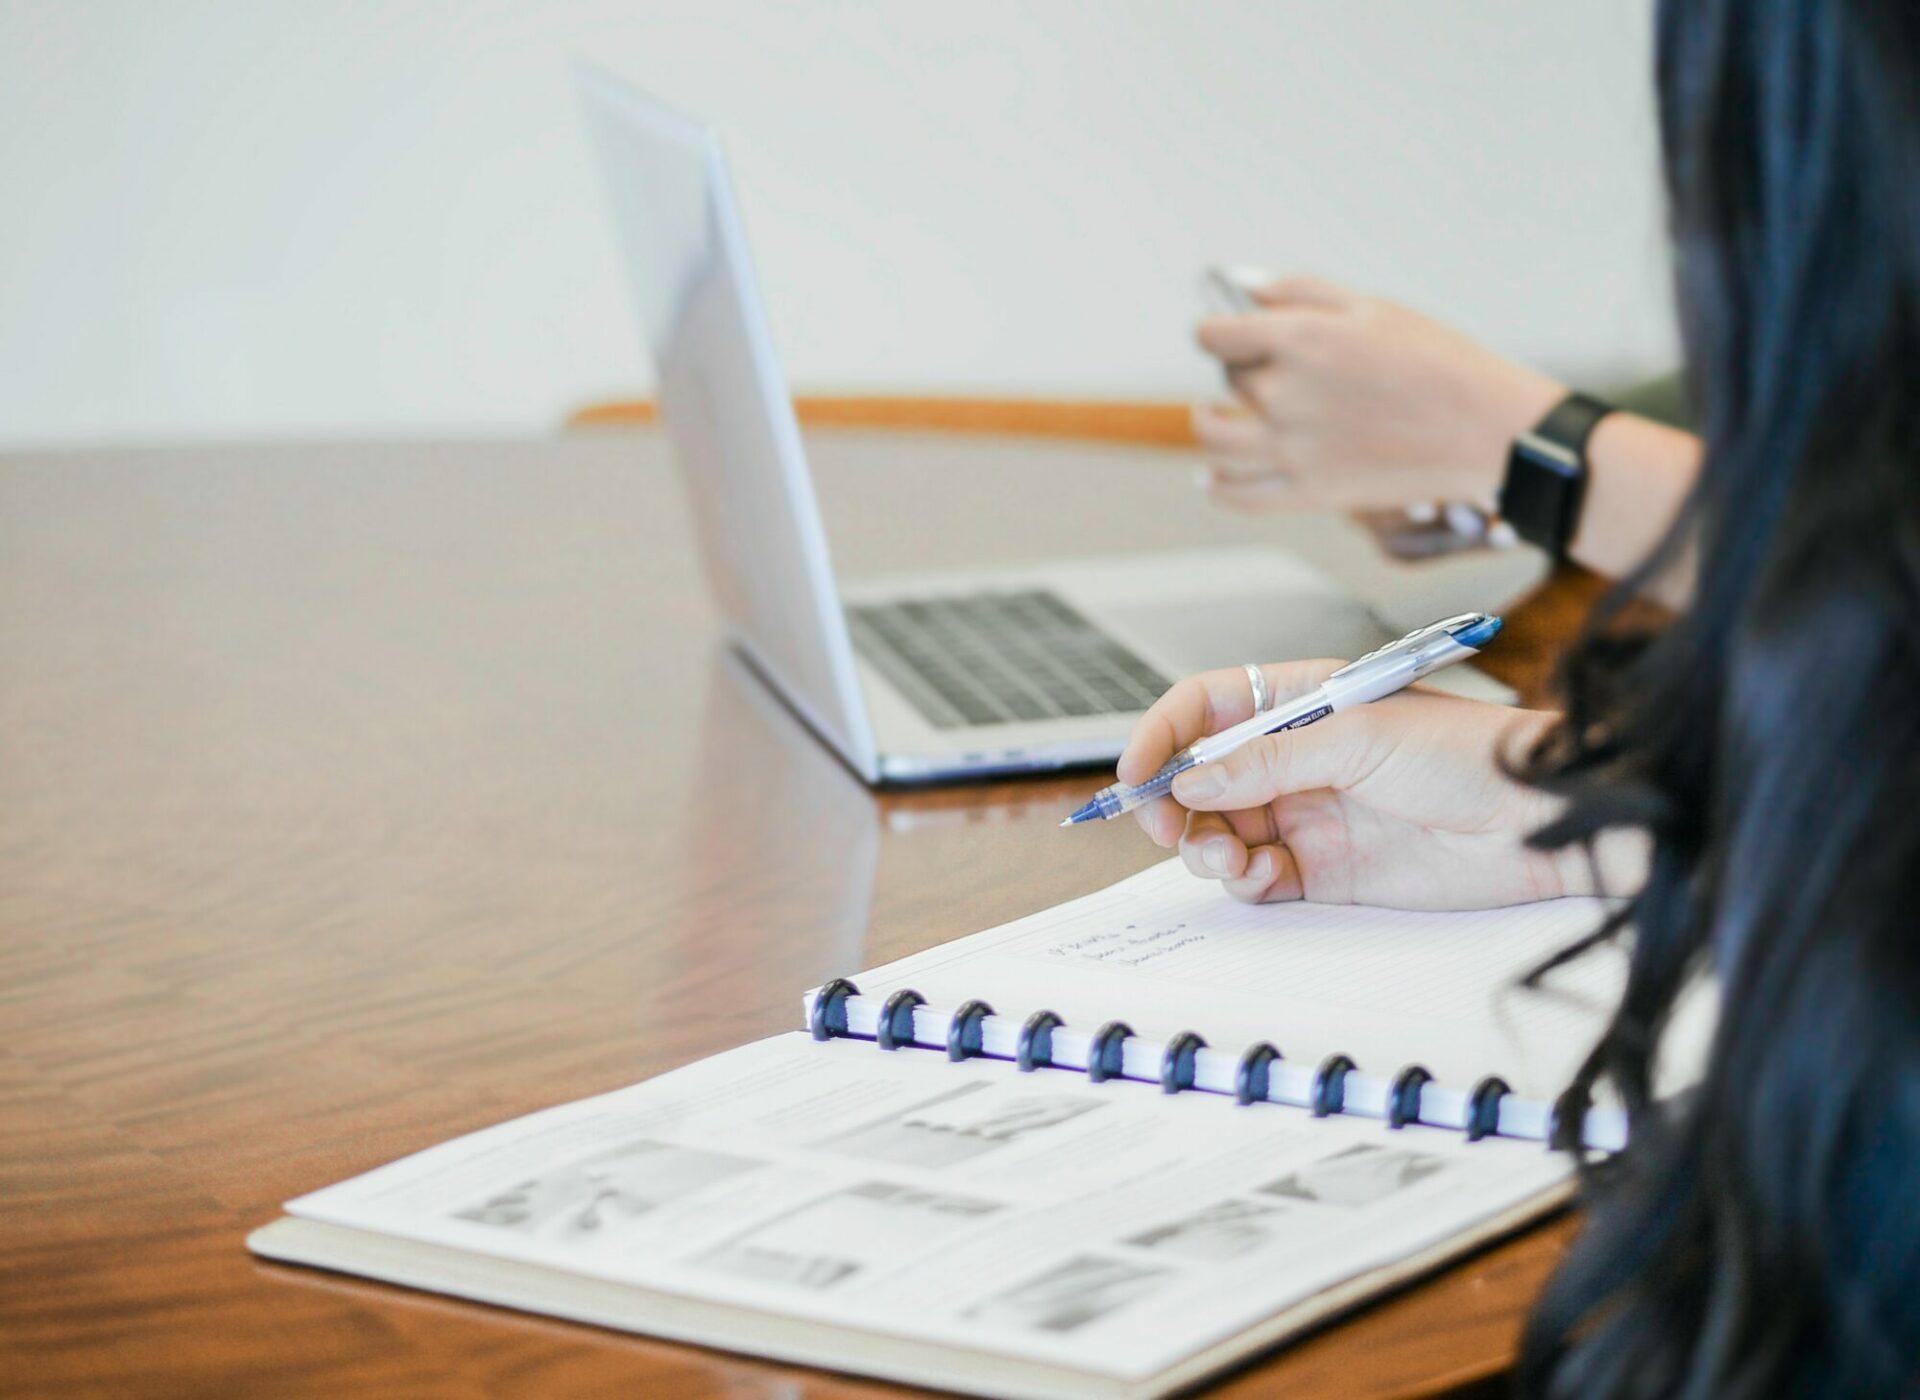 Business woman at desk with bank balance sheet